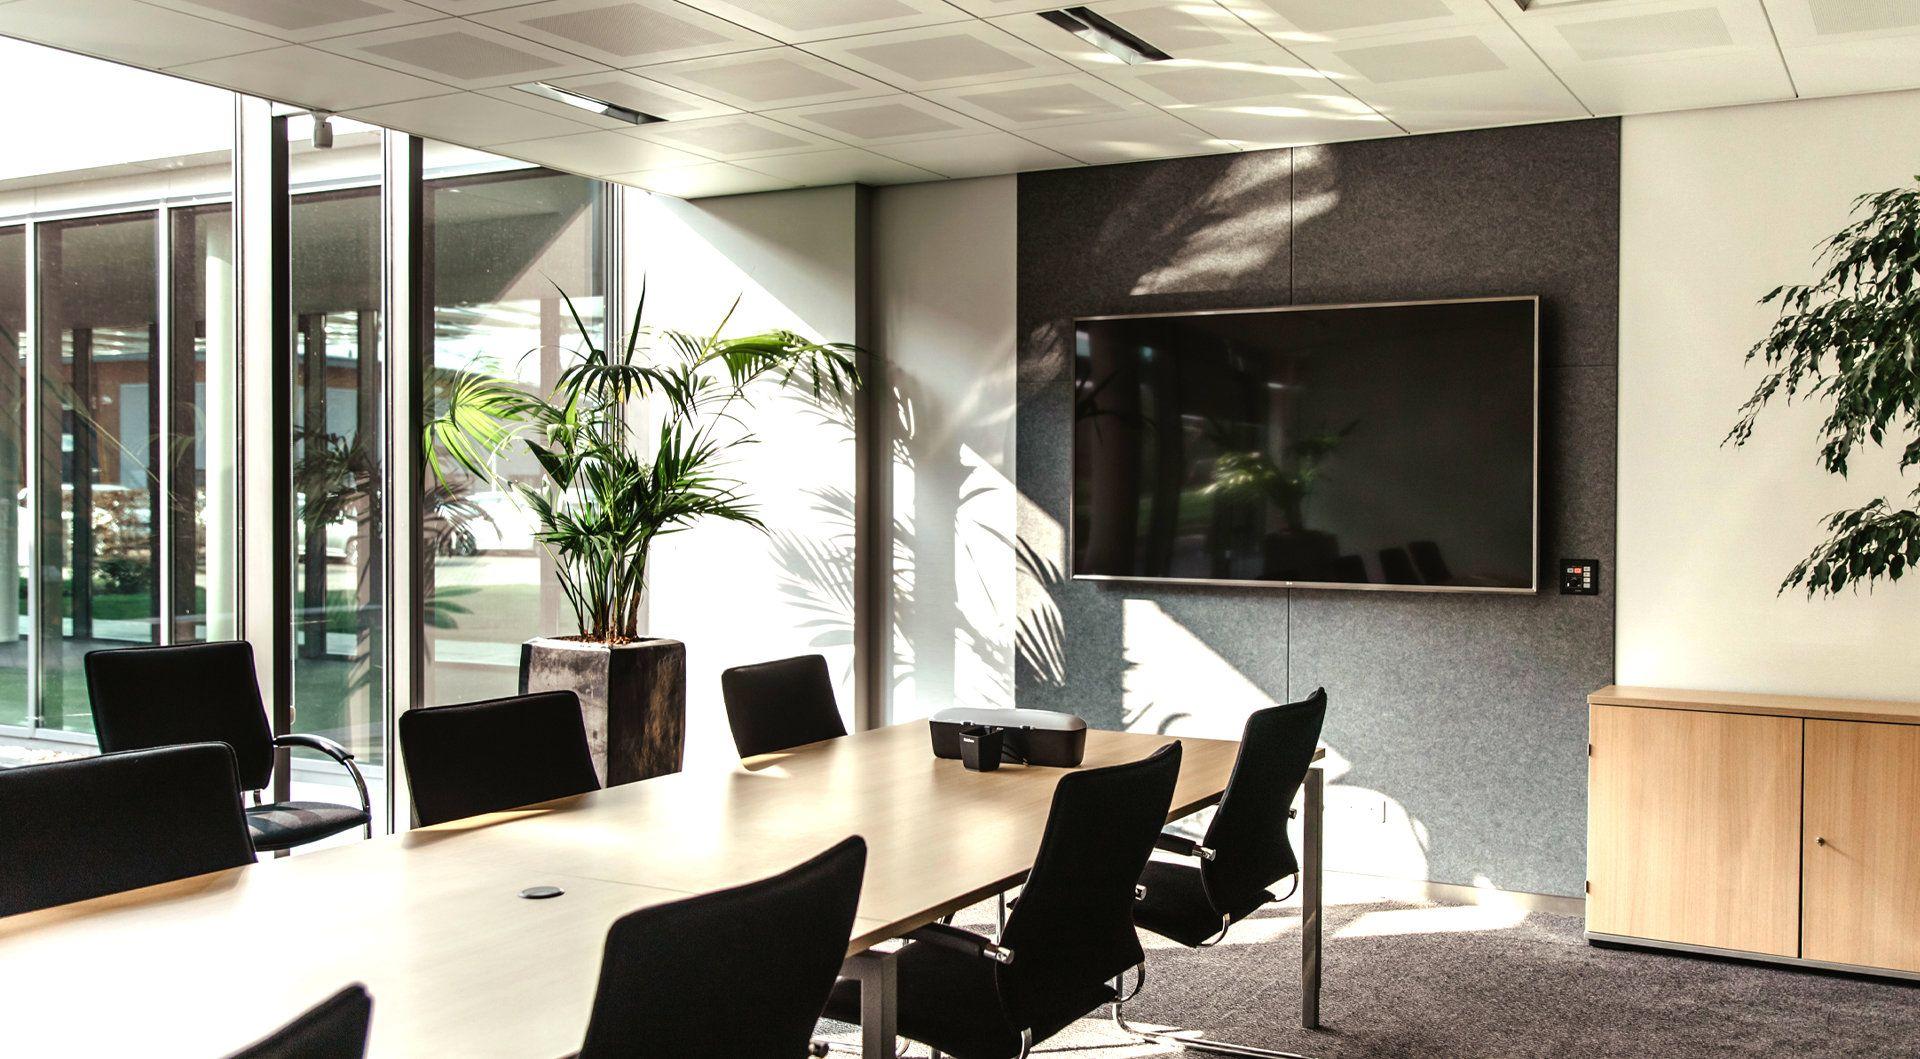 Projecta SlimScreen 180x180 Matte White S projectiescherm 1:1 - Case studie de vries